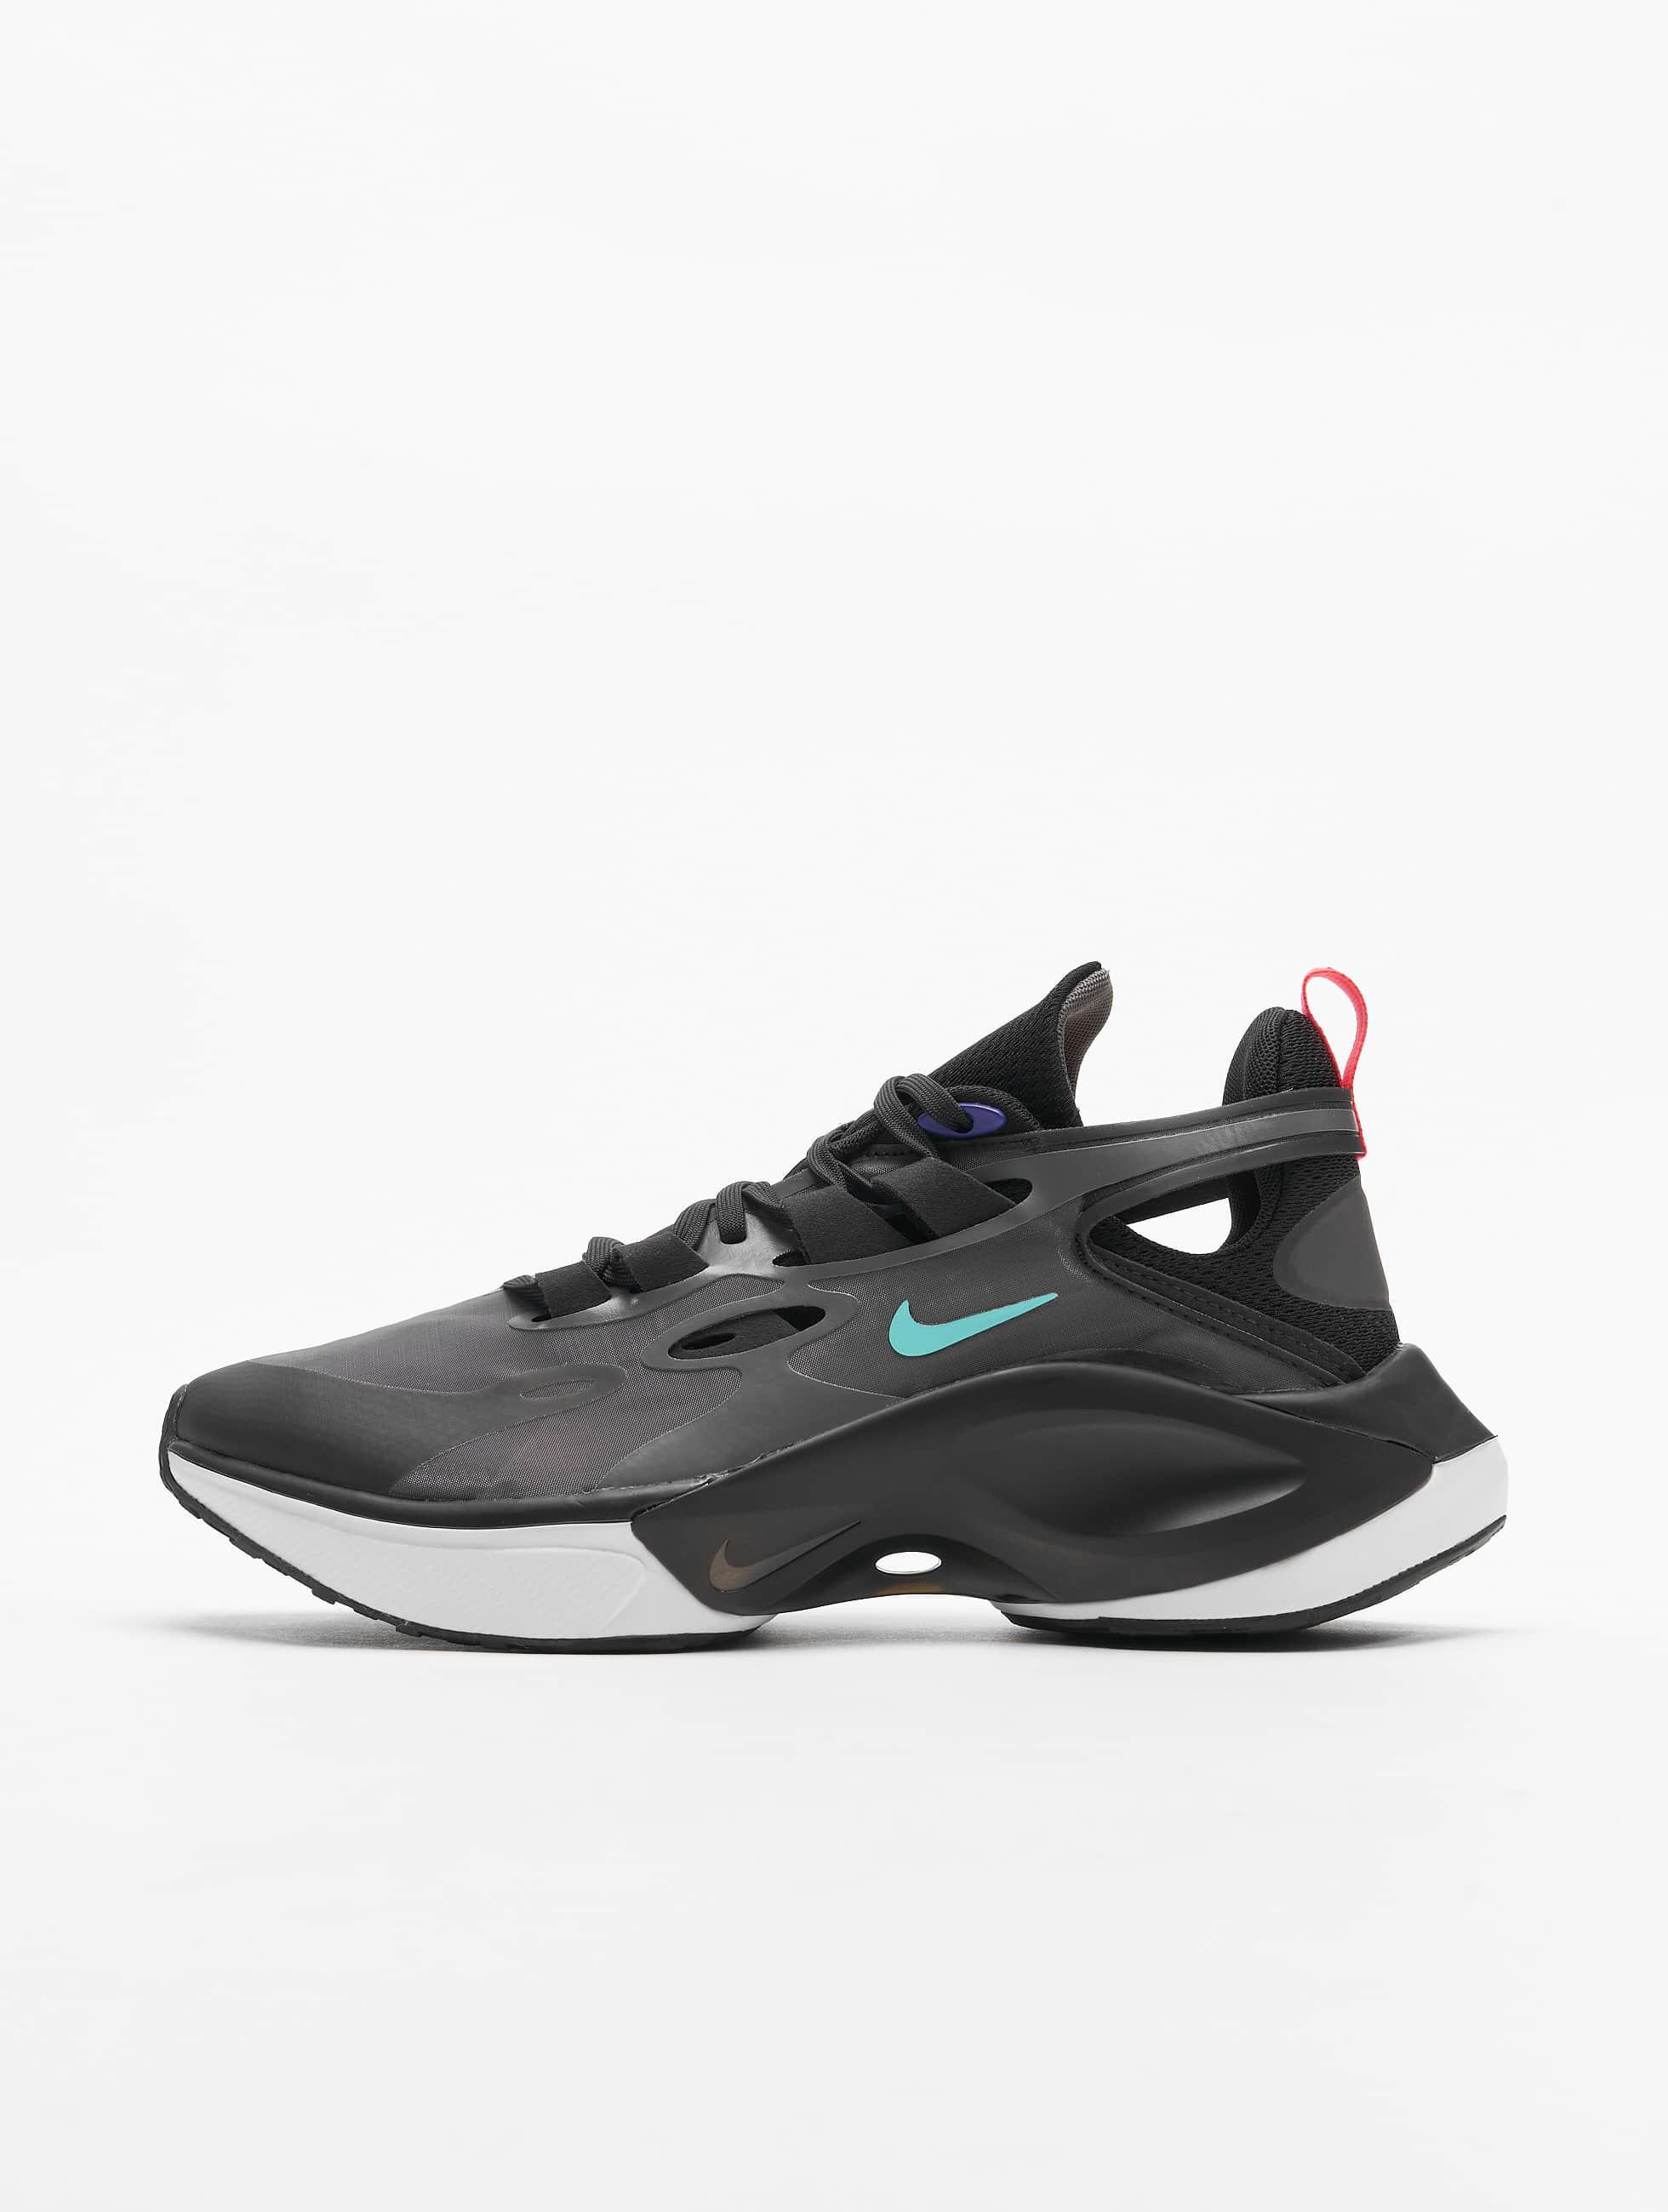 Nike Sportswear Shoes M2K Tekno Plum ChalkPlum ChalkPlum